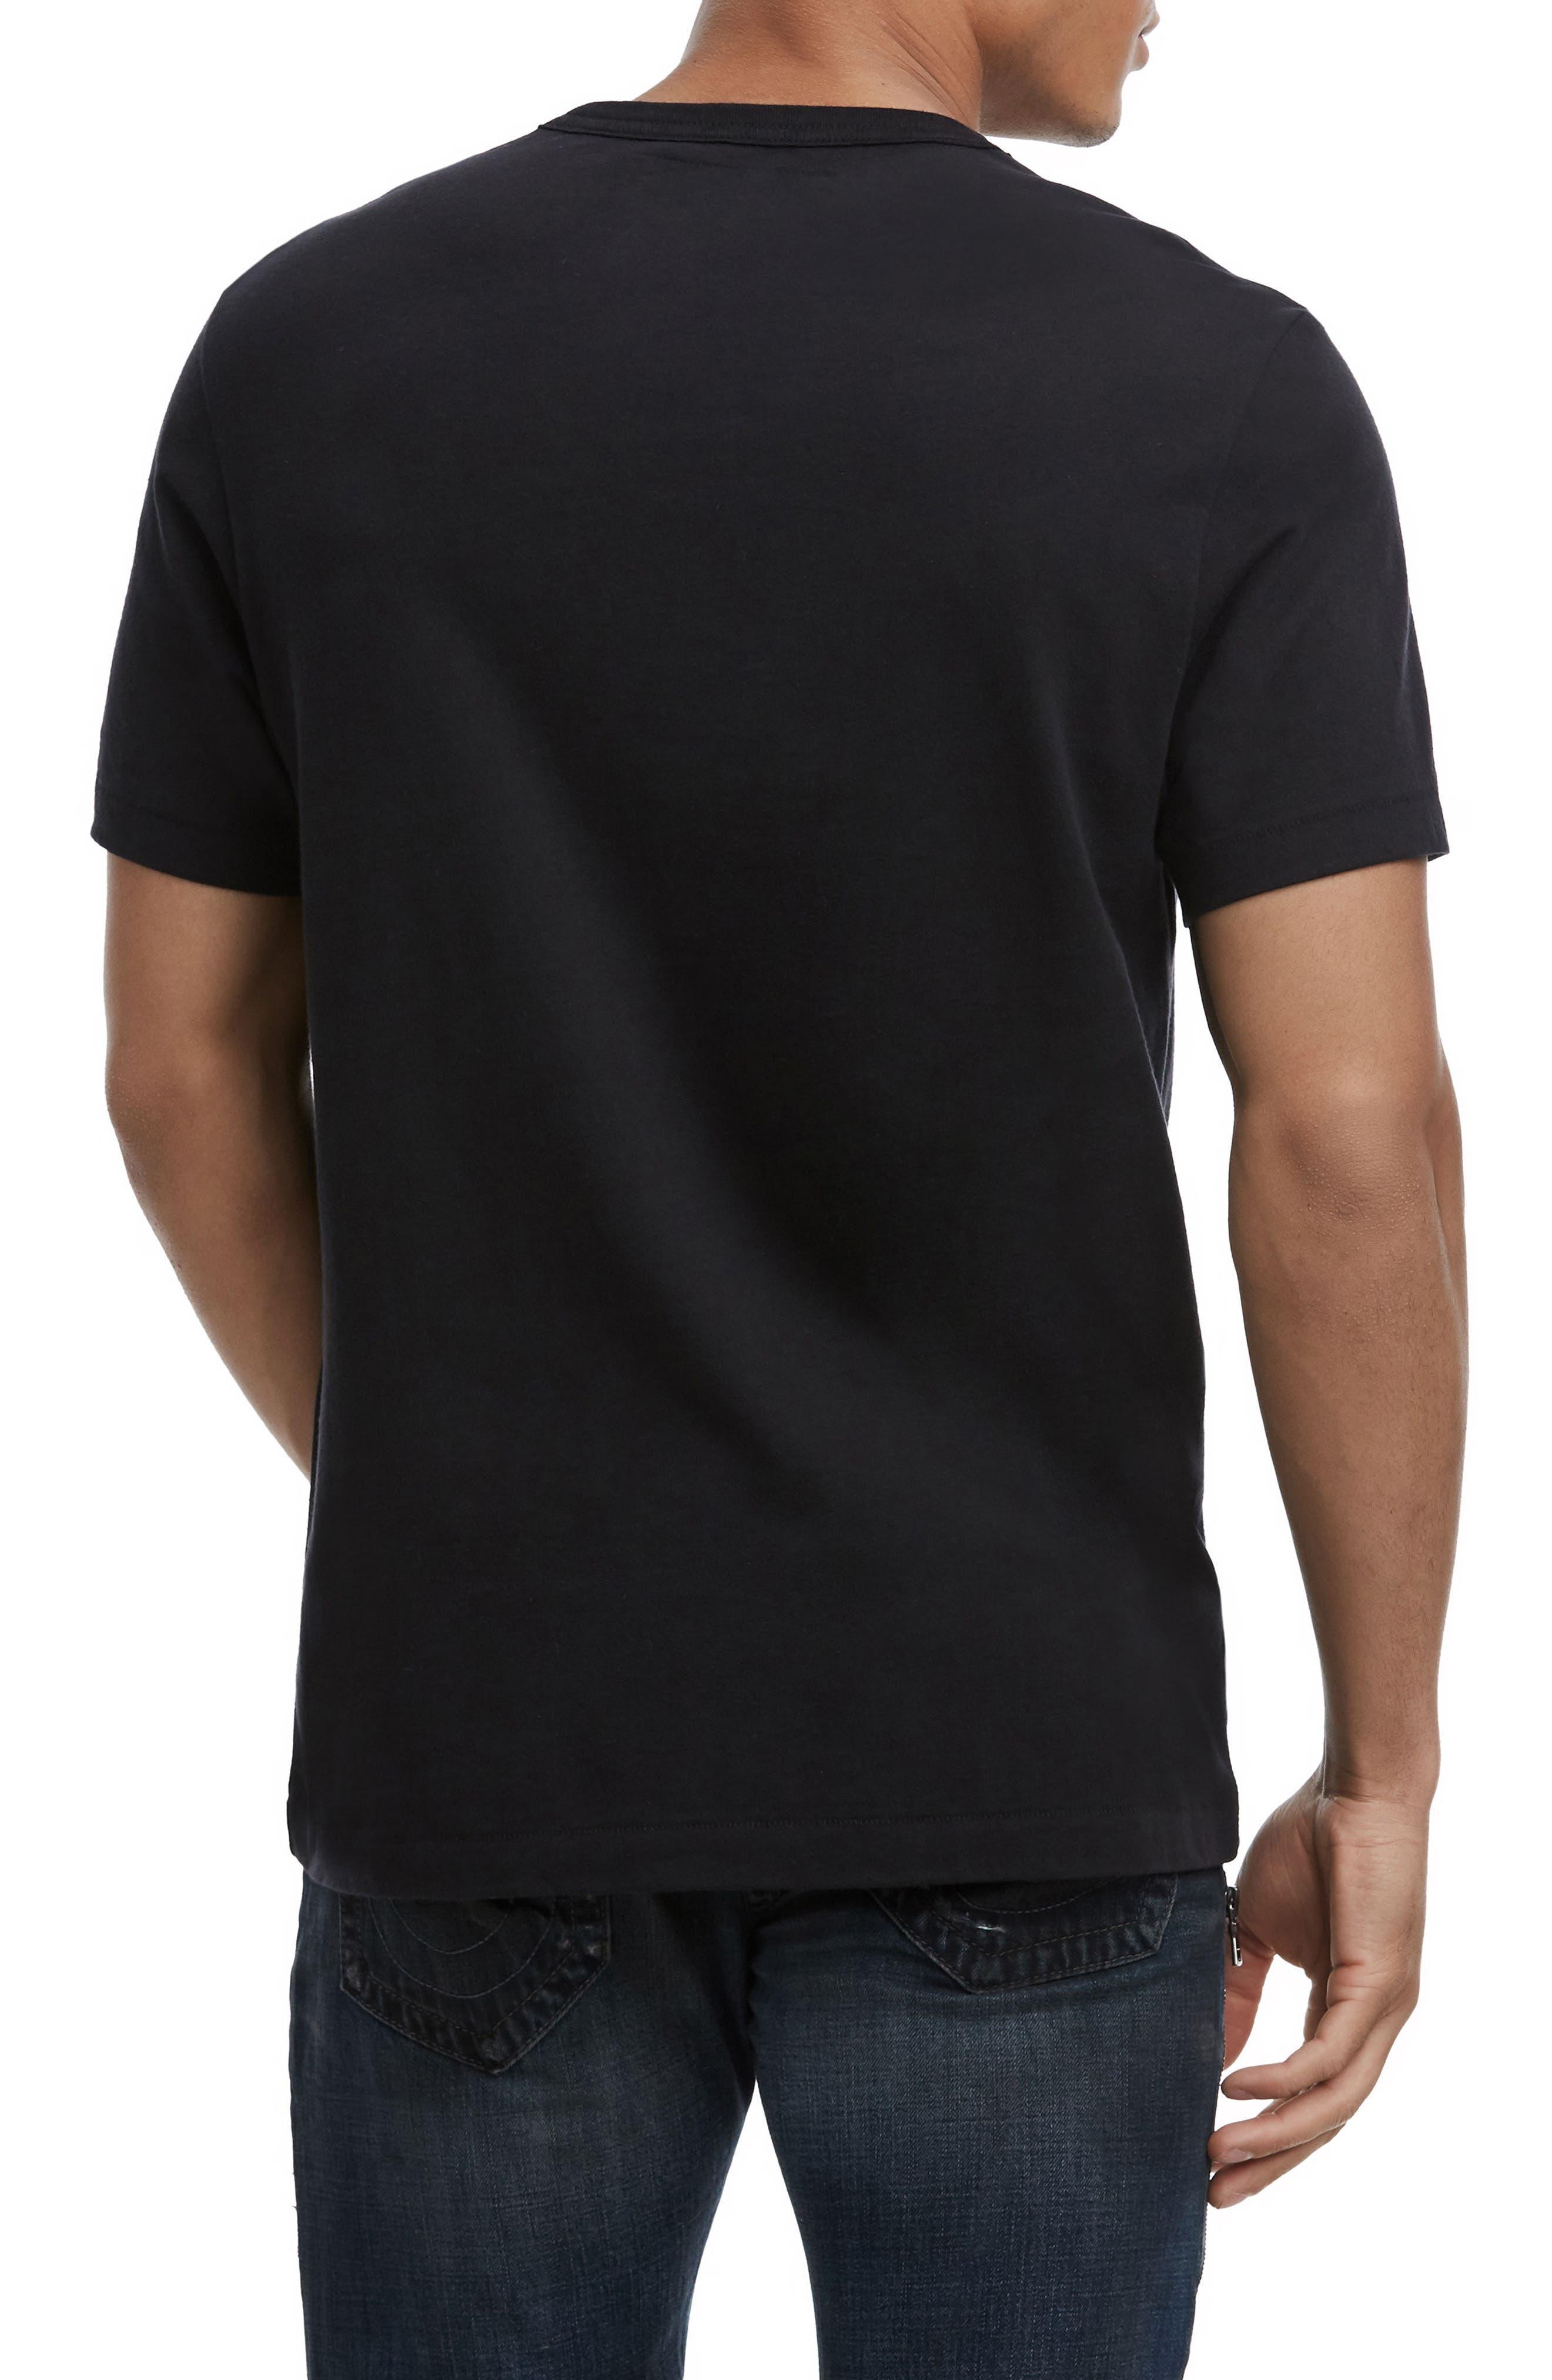 True Vices Graphic T-Shirt,                             Alternate thumbnail 2, color,                             TRUE BLACK